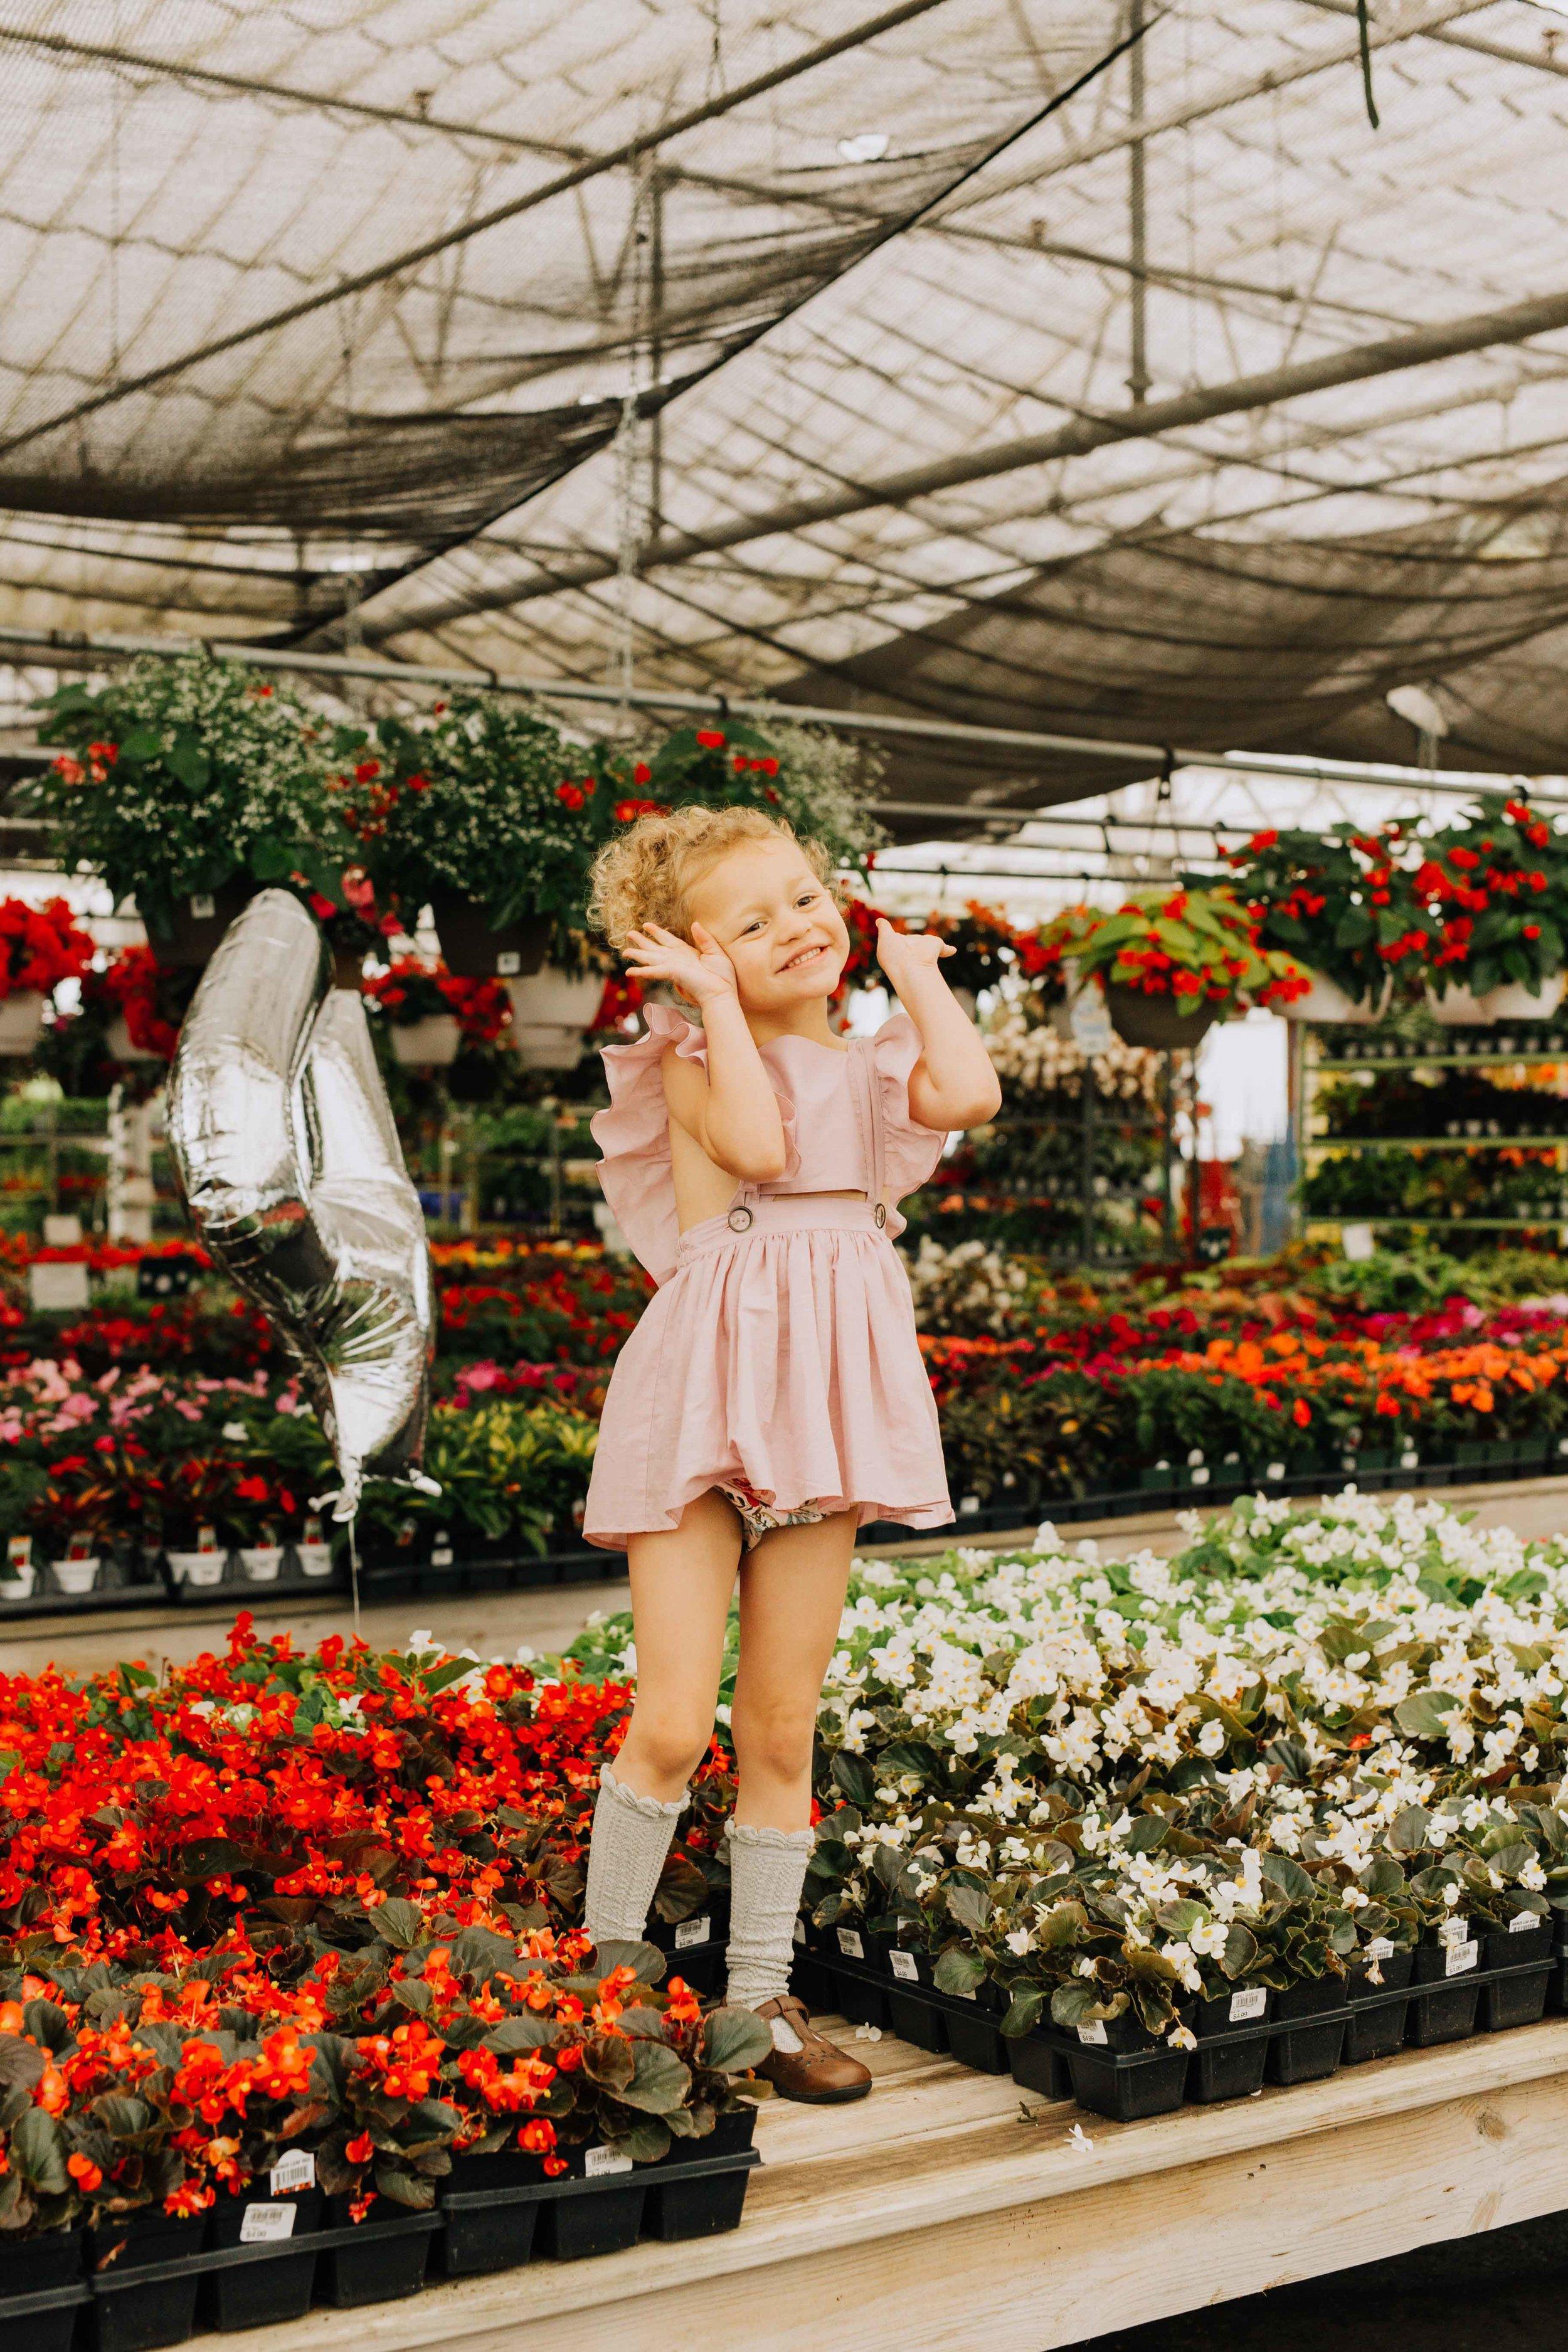 Merrifield-garden-greenhouse-indoor-Jacqueline-Waters-Photography-Red-dress-family- (282).jpg